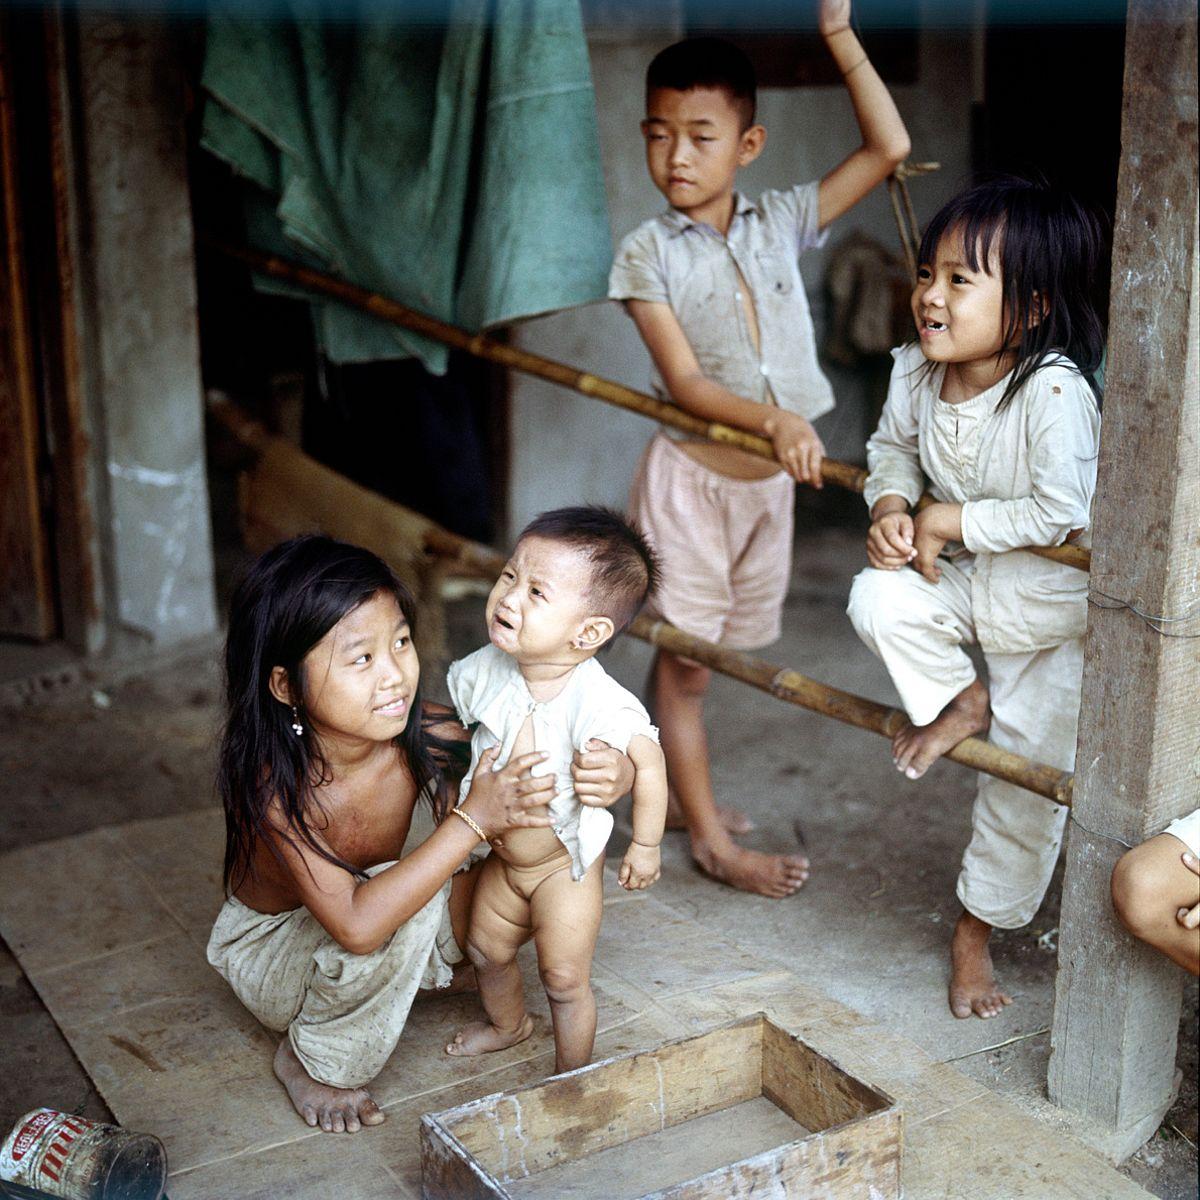 [Photos] The Children of 1967 Vietnam - Saigoneer